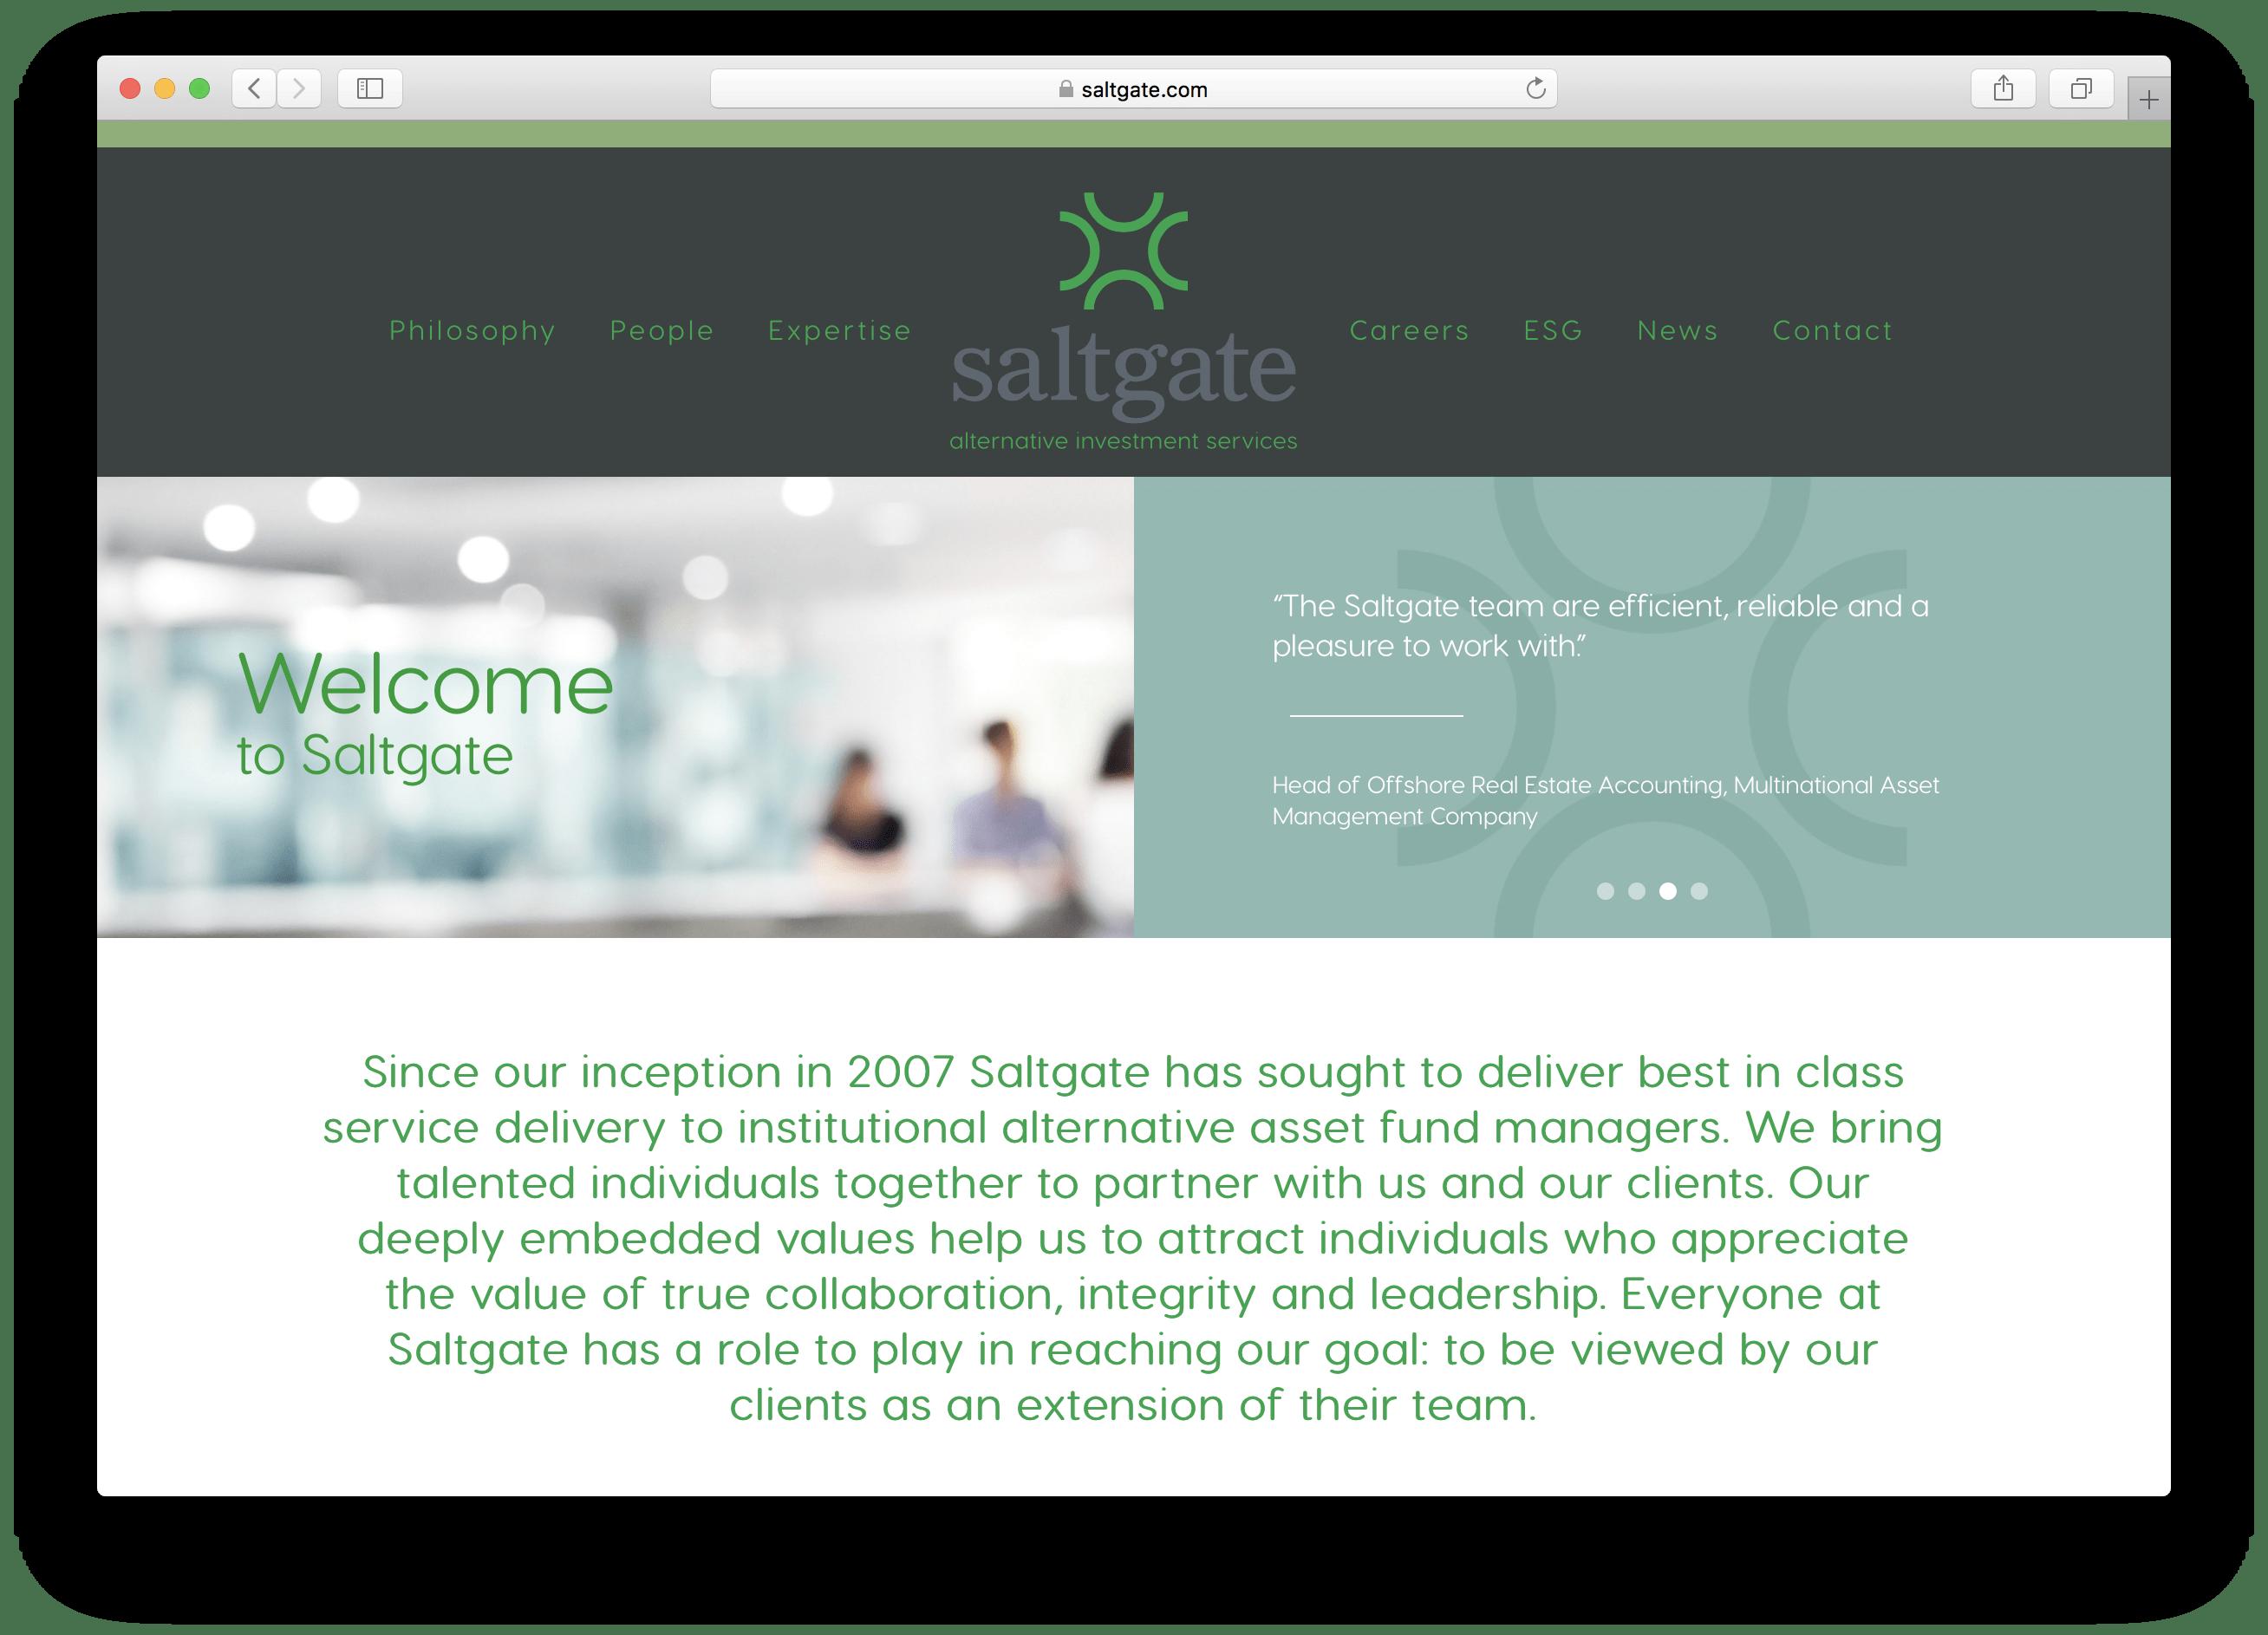 Saltgate